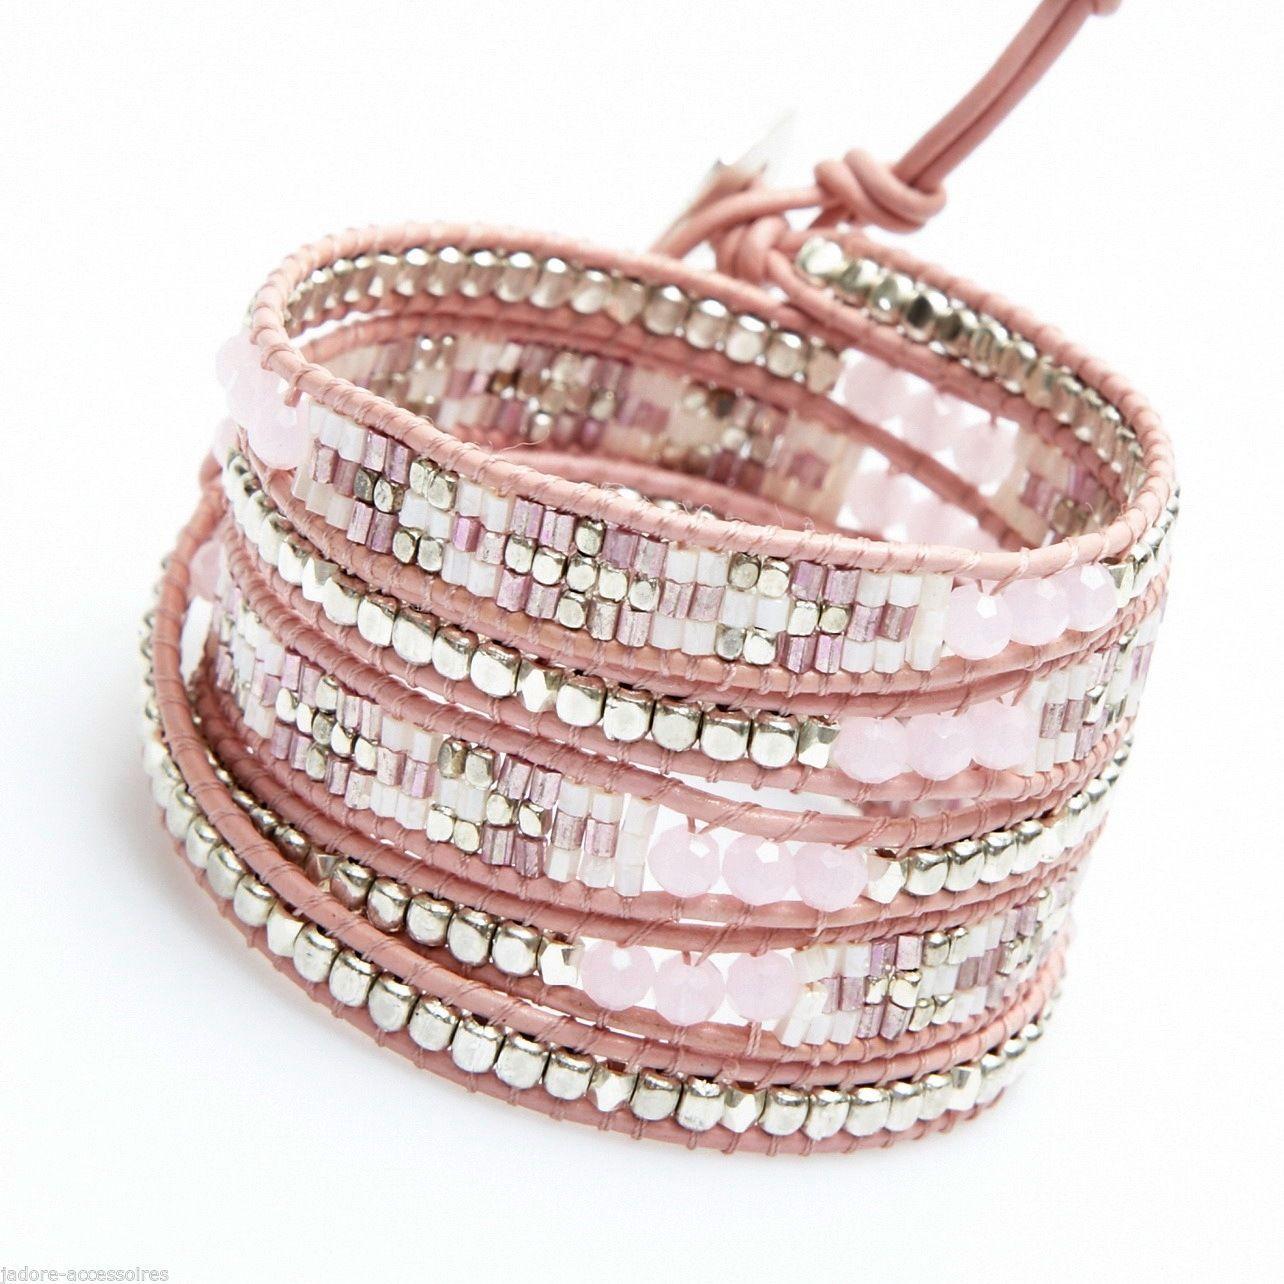 Wrap Bracelet Tresse Nakamol 5 Tours Rose Dore | eBay